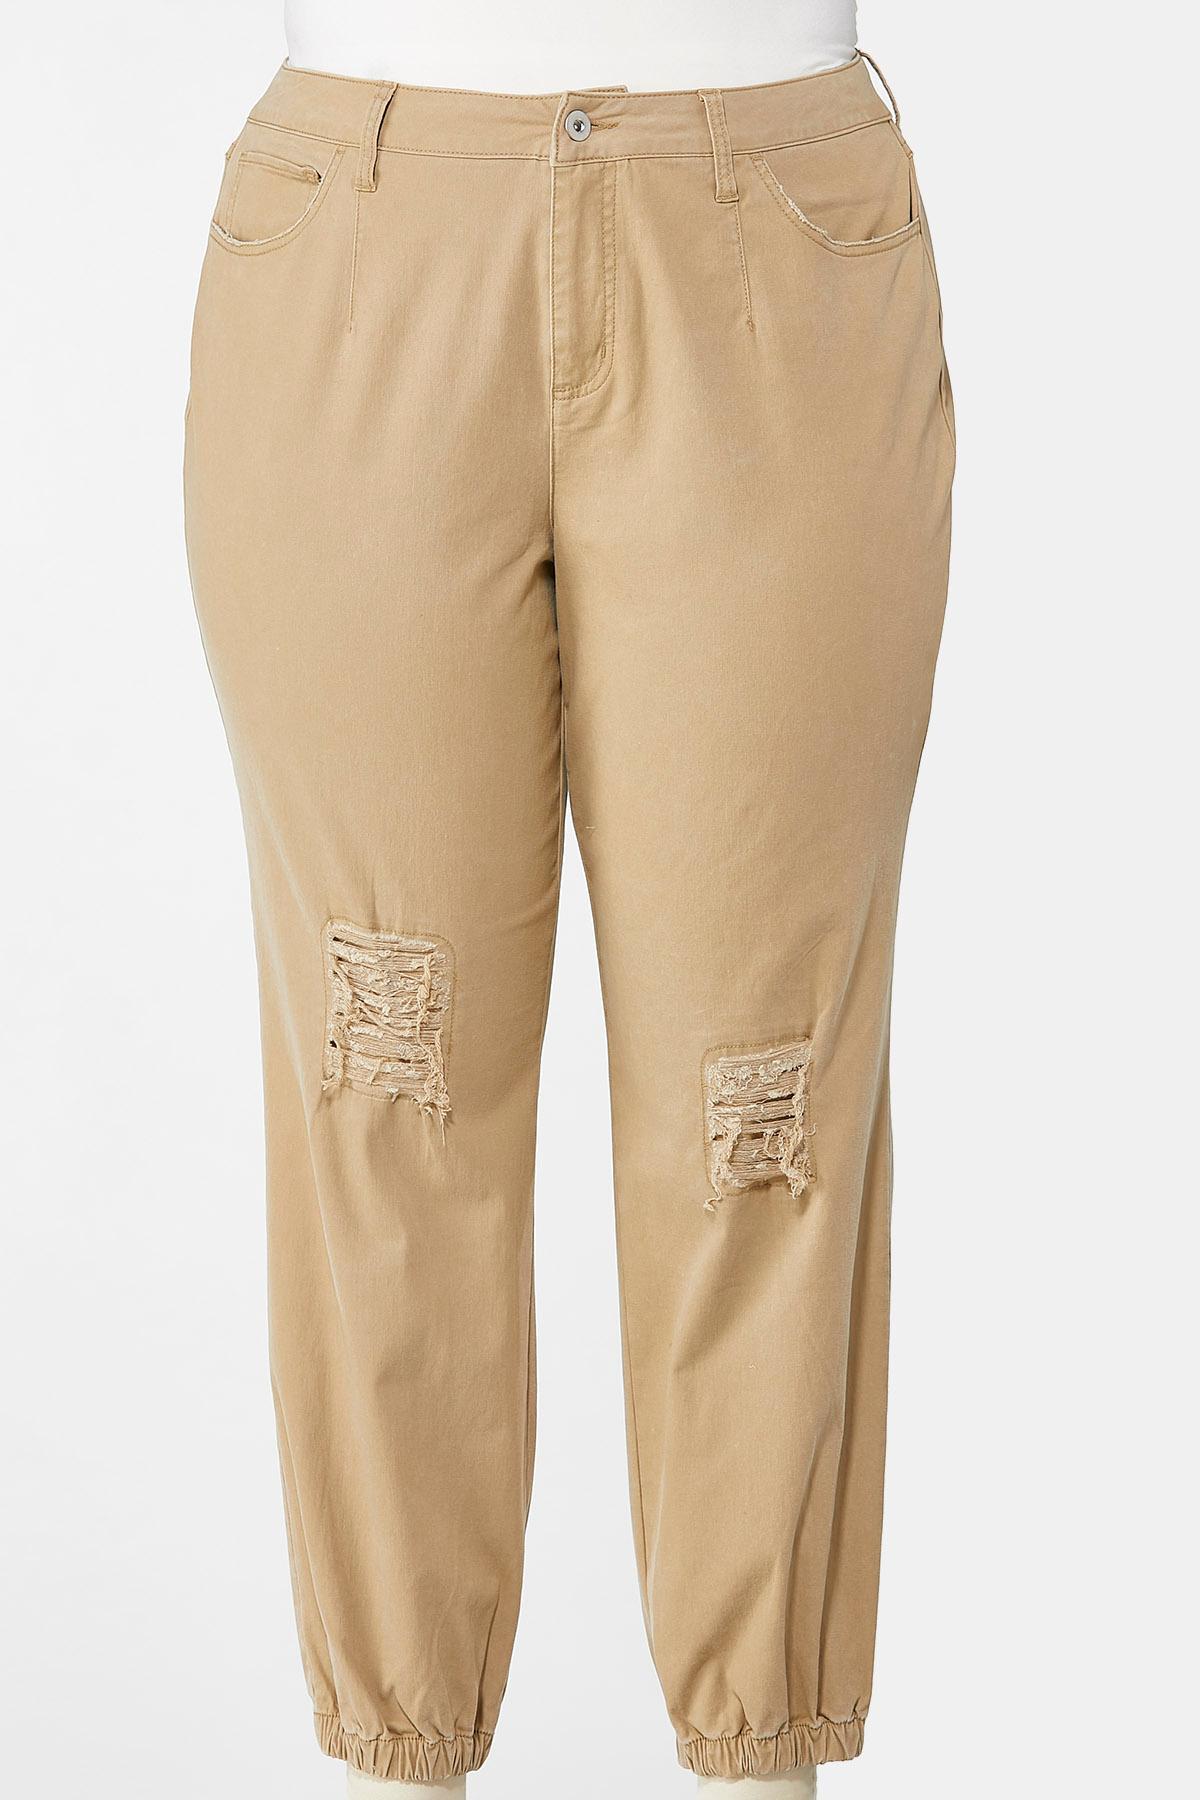 Plus Size Khaki Twill Joggers